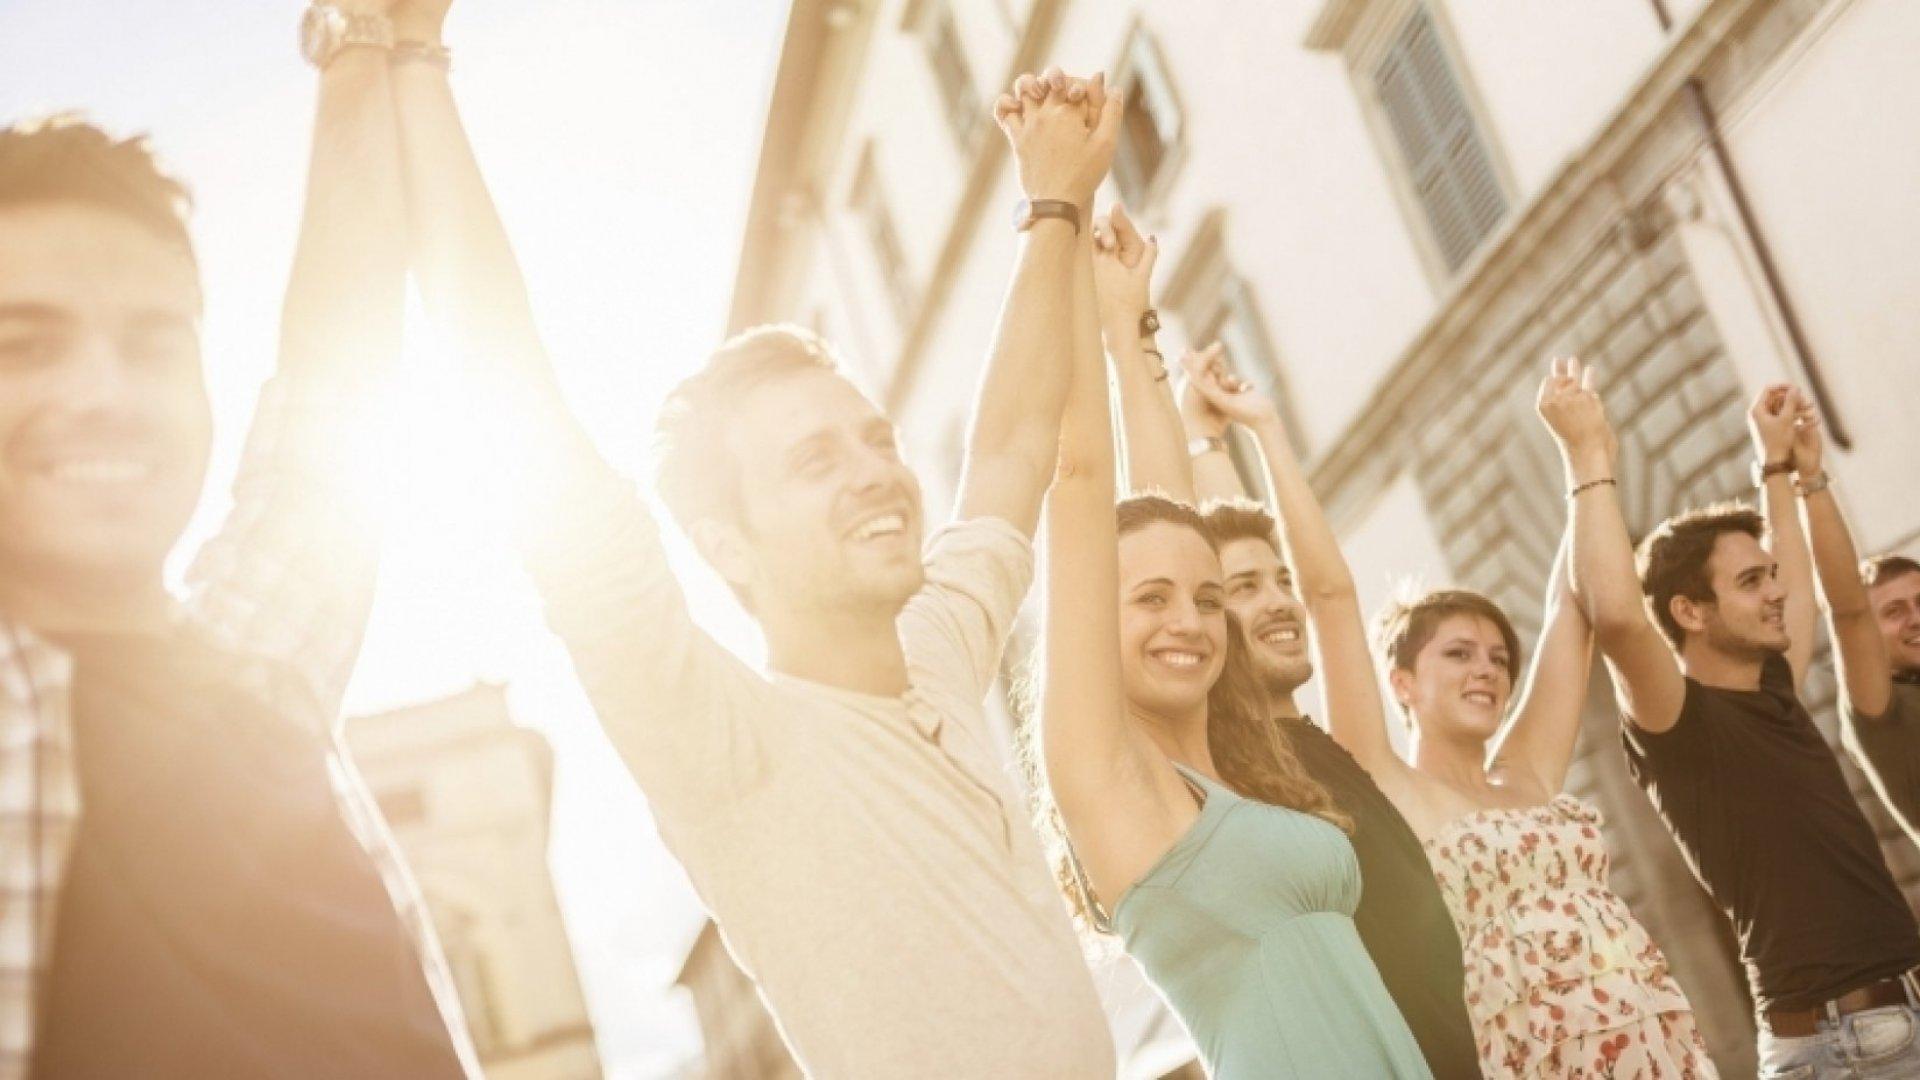 In Defense of Millennials